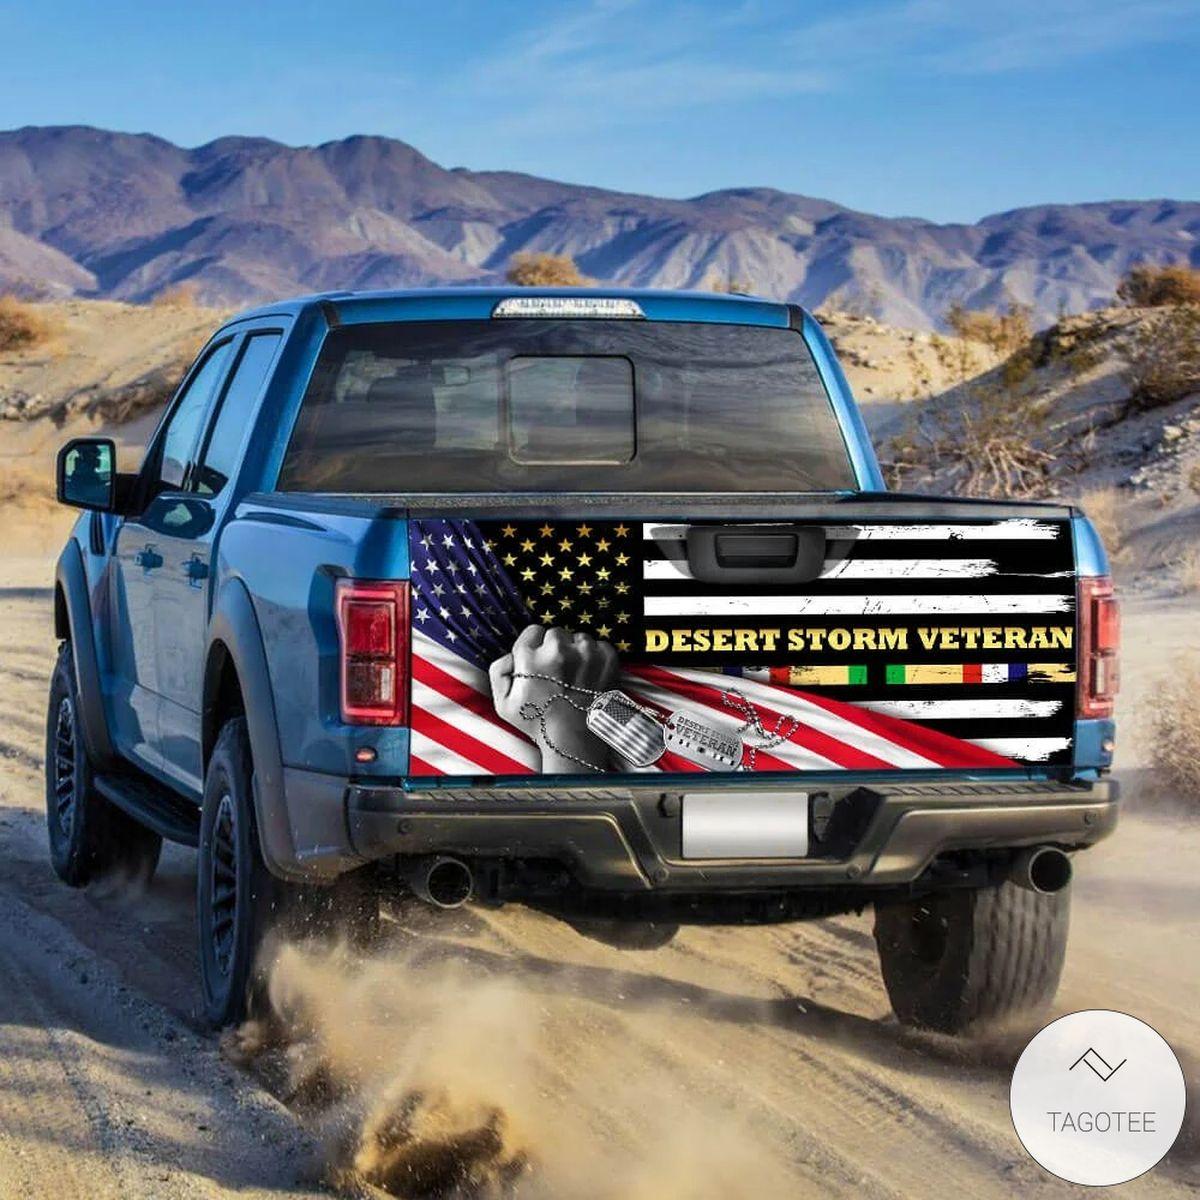 Desert Storm Veteran Tailgate Wrapz